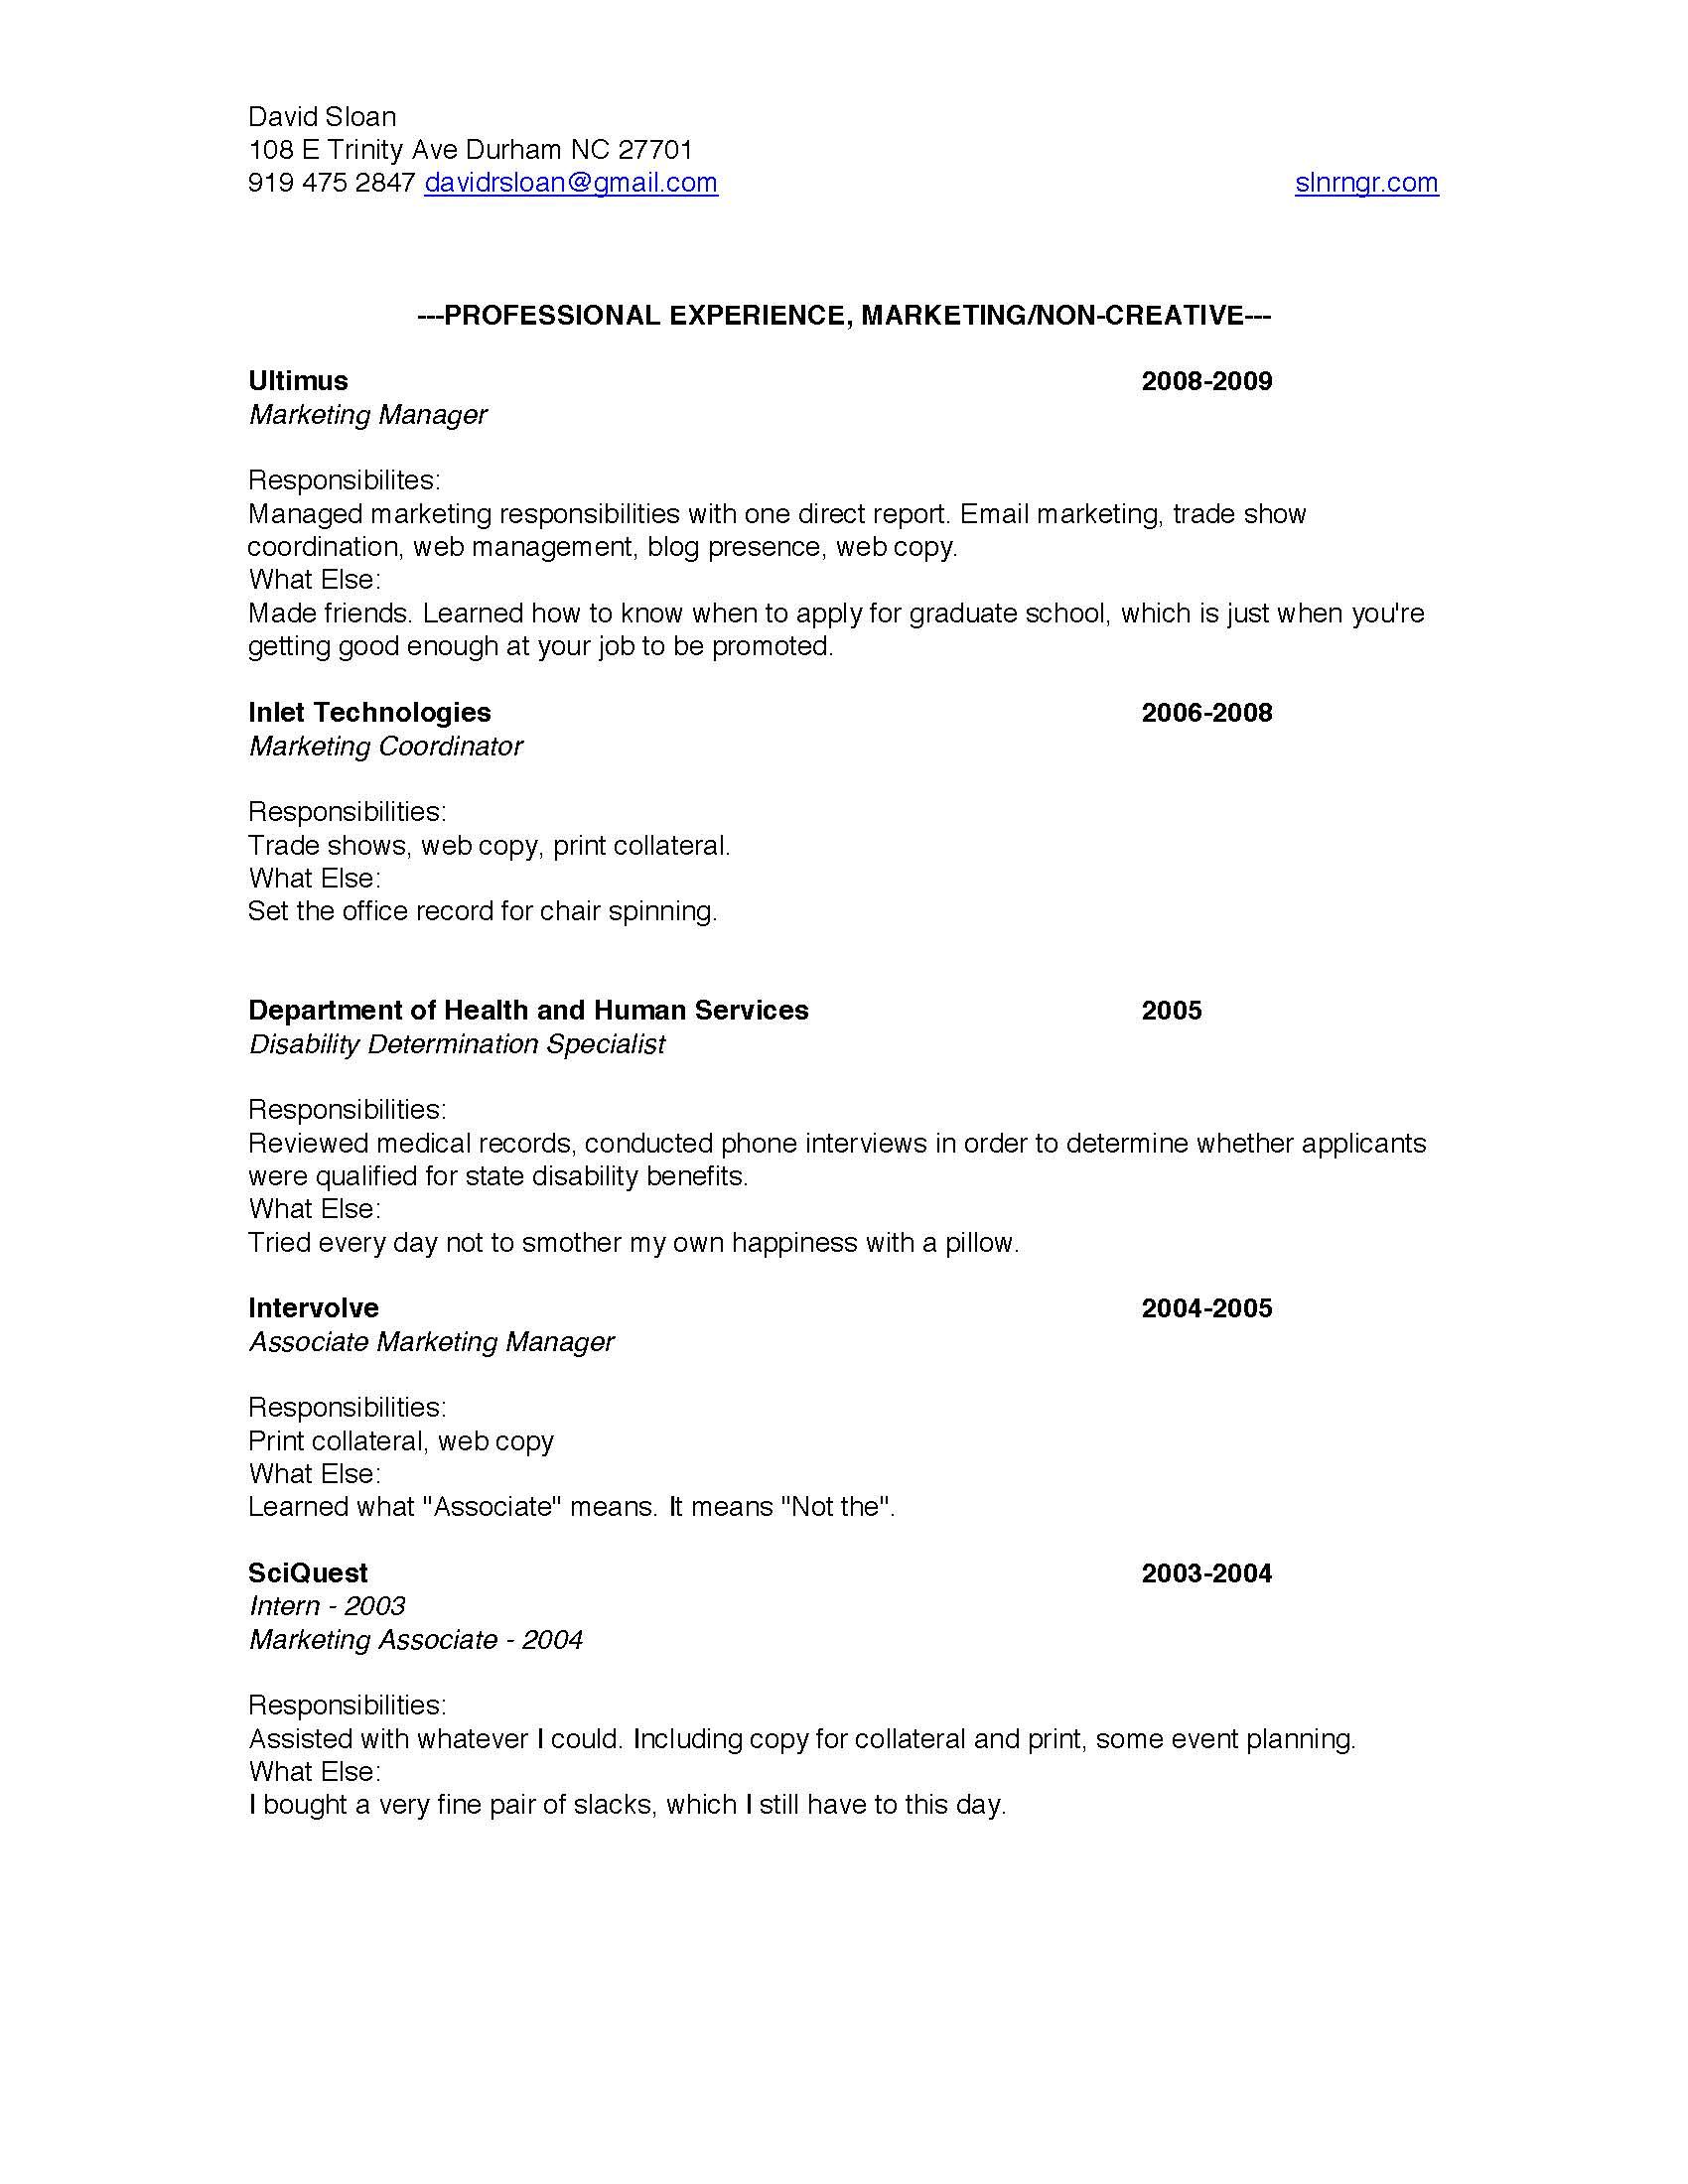 David Sloan Resume Feb 2014_Page_2.jpg